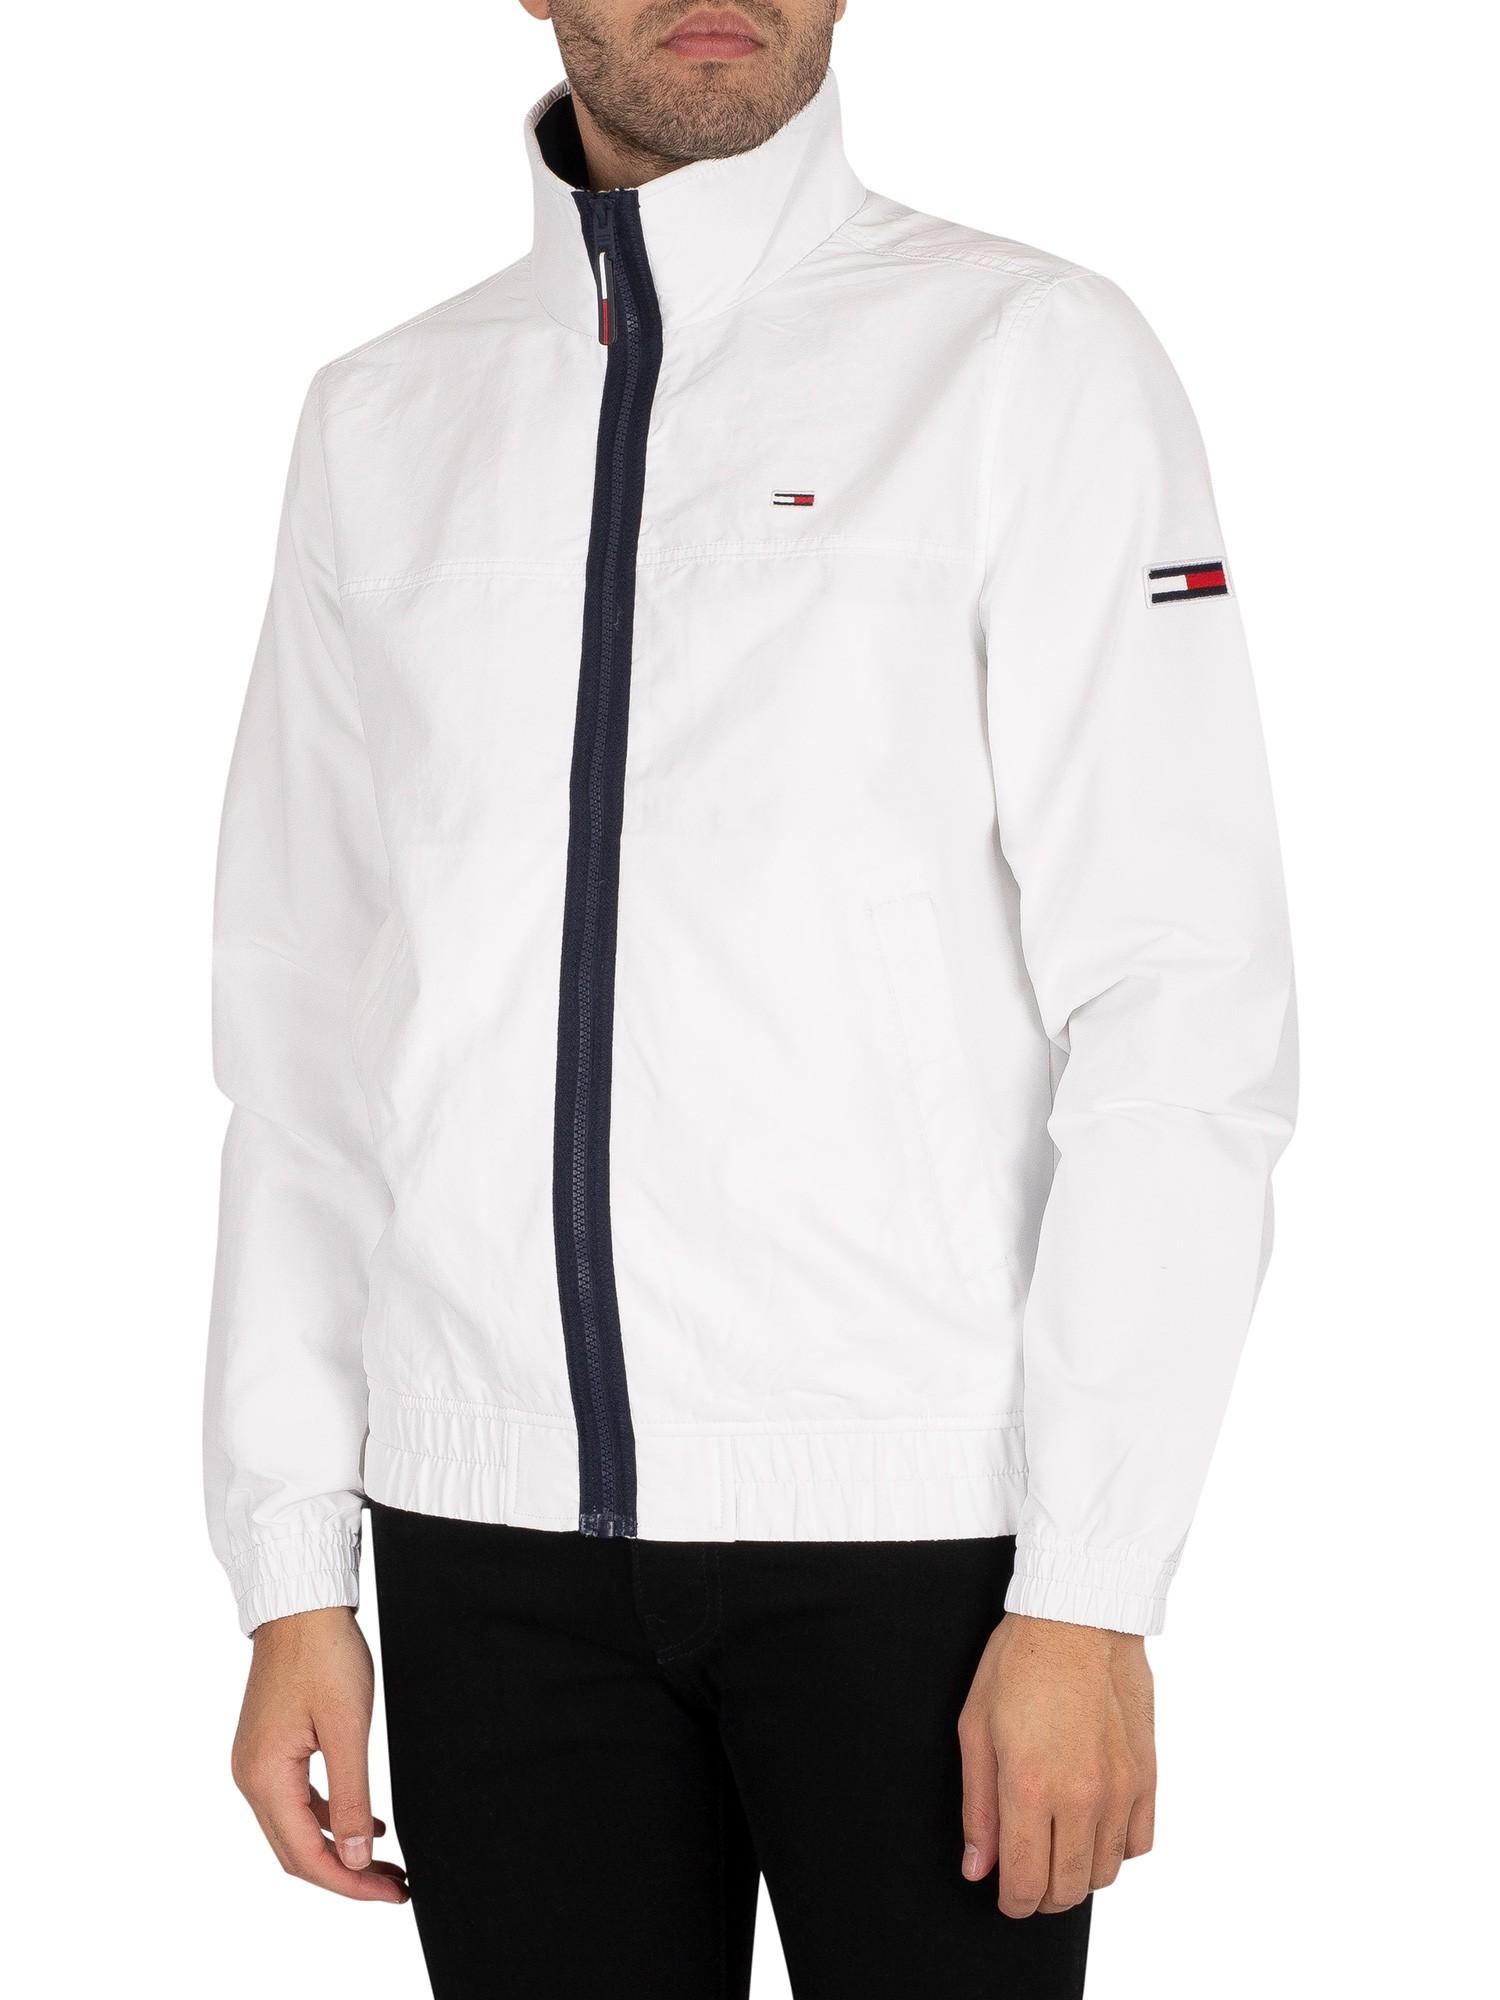 Essential Casual Lightweight Jacket